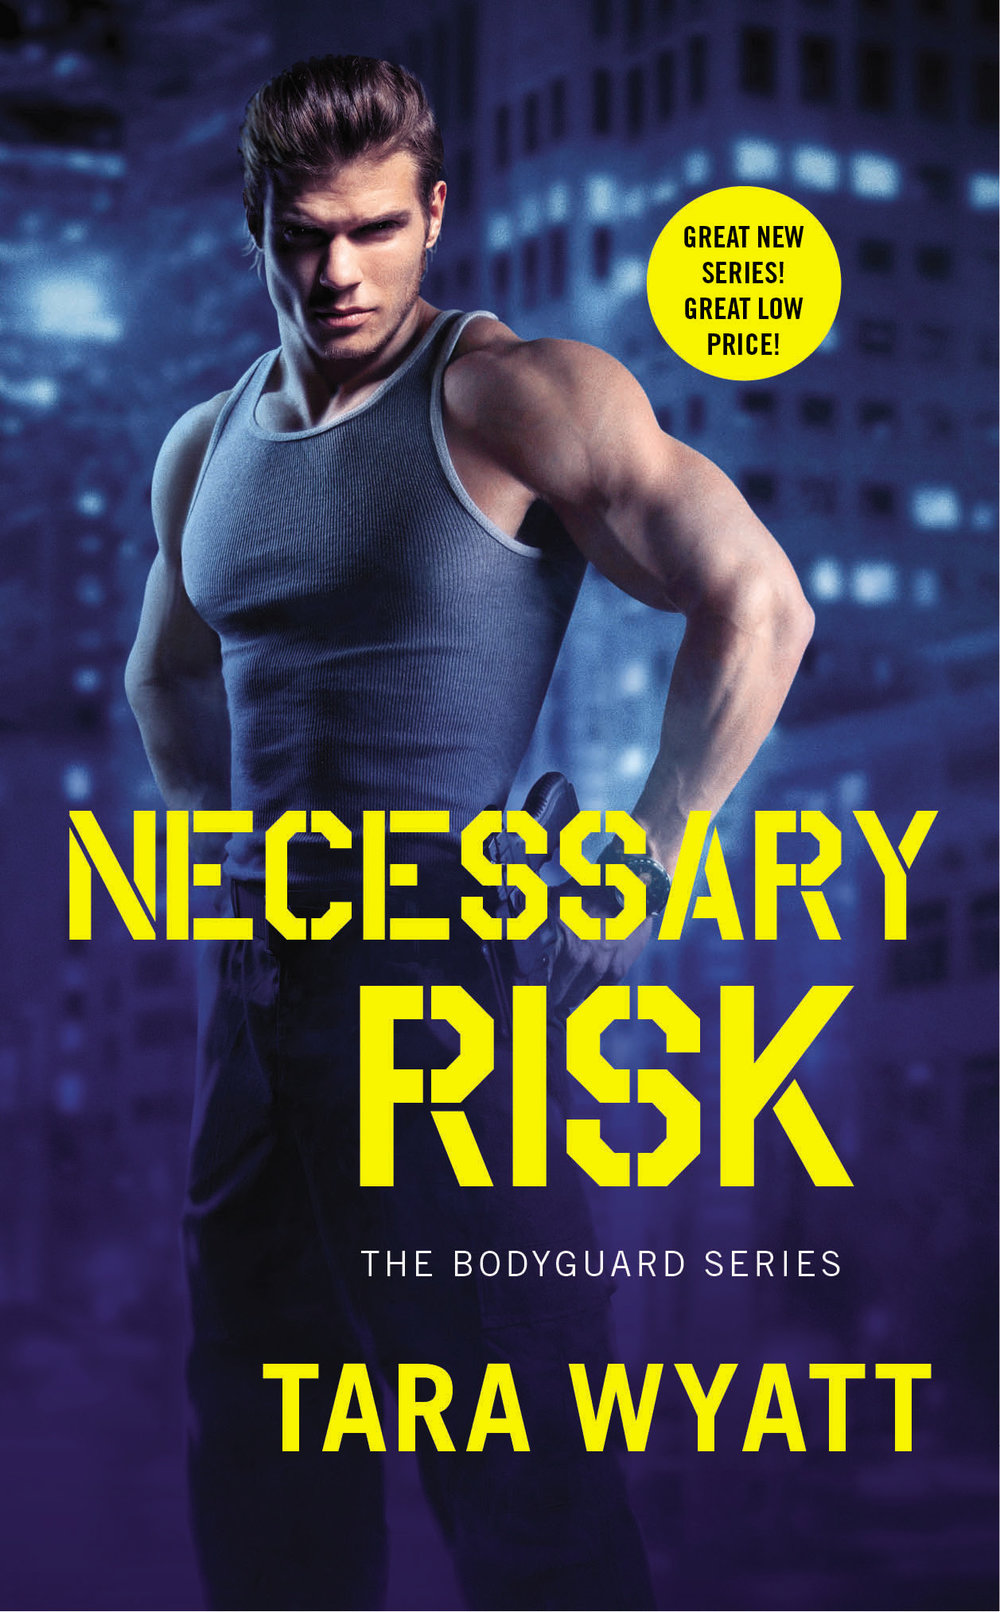 Necessary Risk by Tara Wyatt The Bodyguard Series Book 1 Romantic Suspense